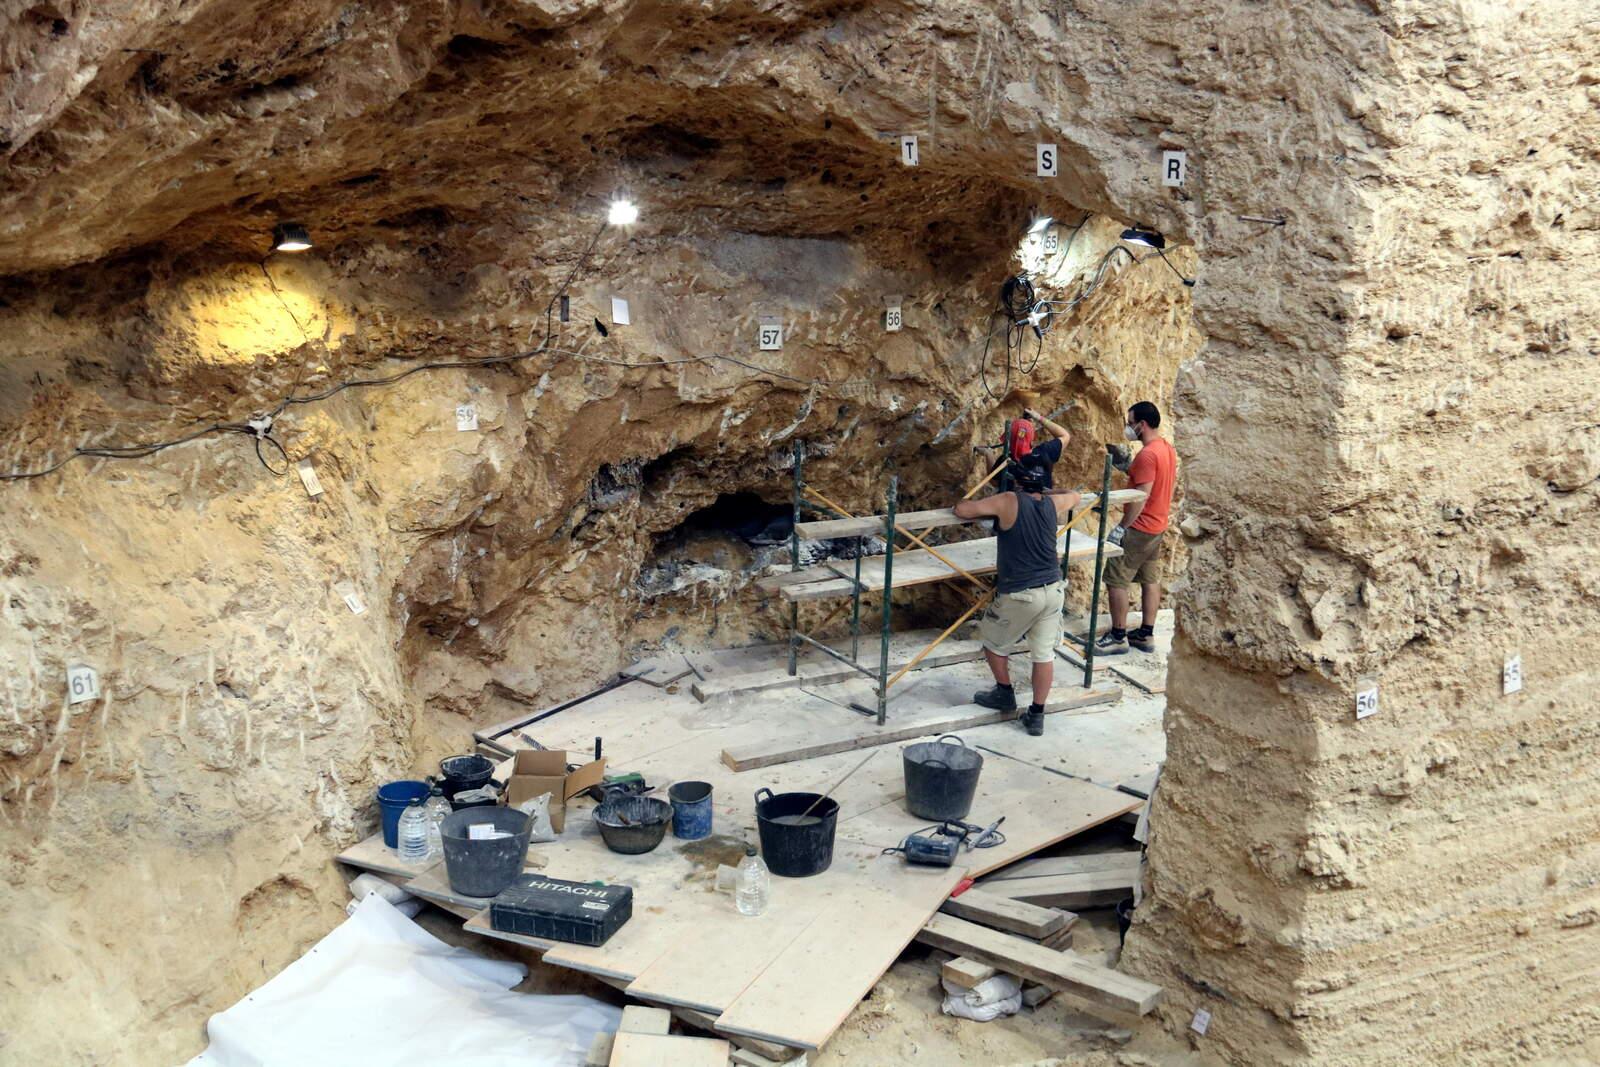 Arqueòlegs treballant a l'Abric Romaní de Capellades